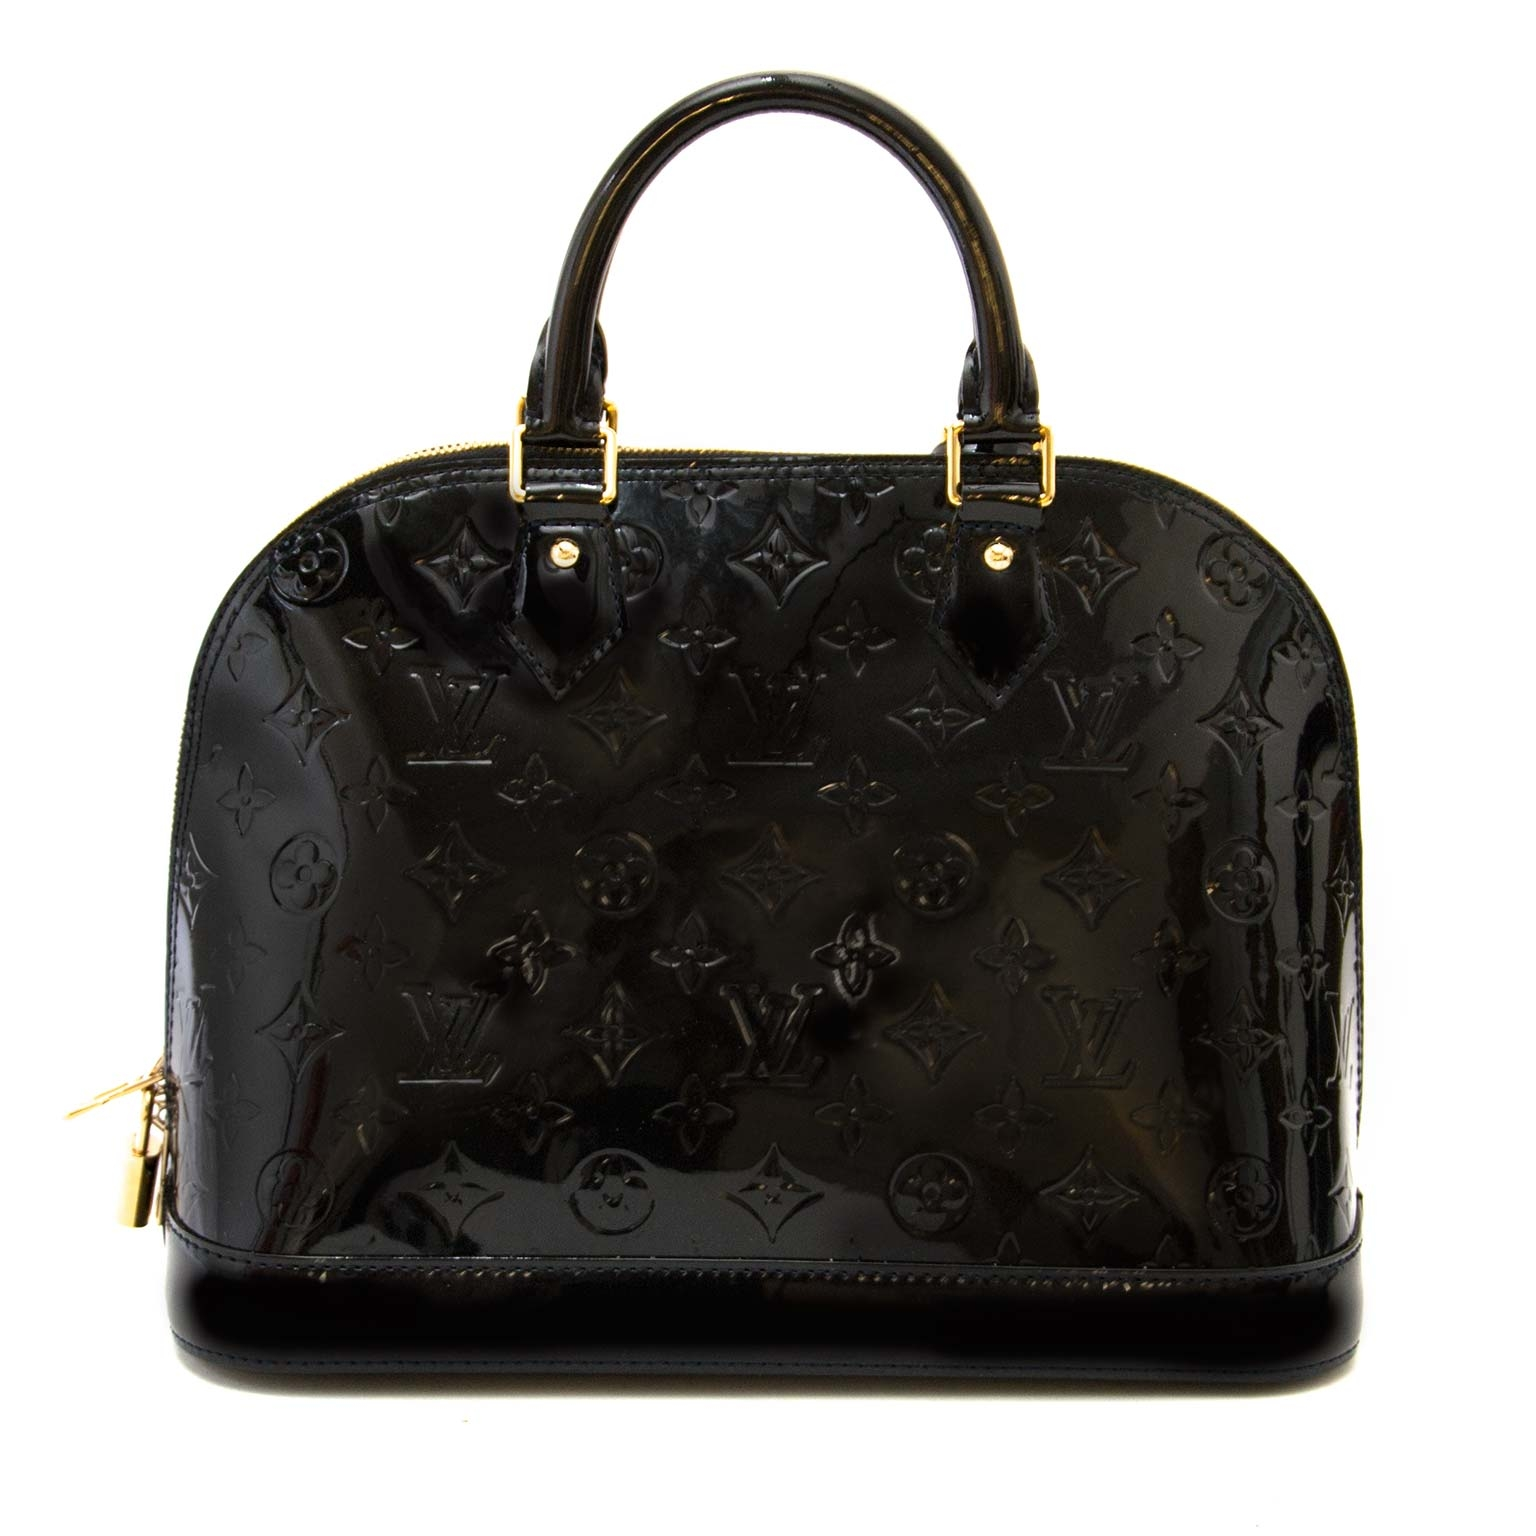 acheter en ligne seconde main Louis Vuitton Black Alma Monogram Vernis PM